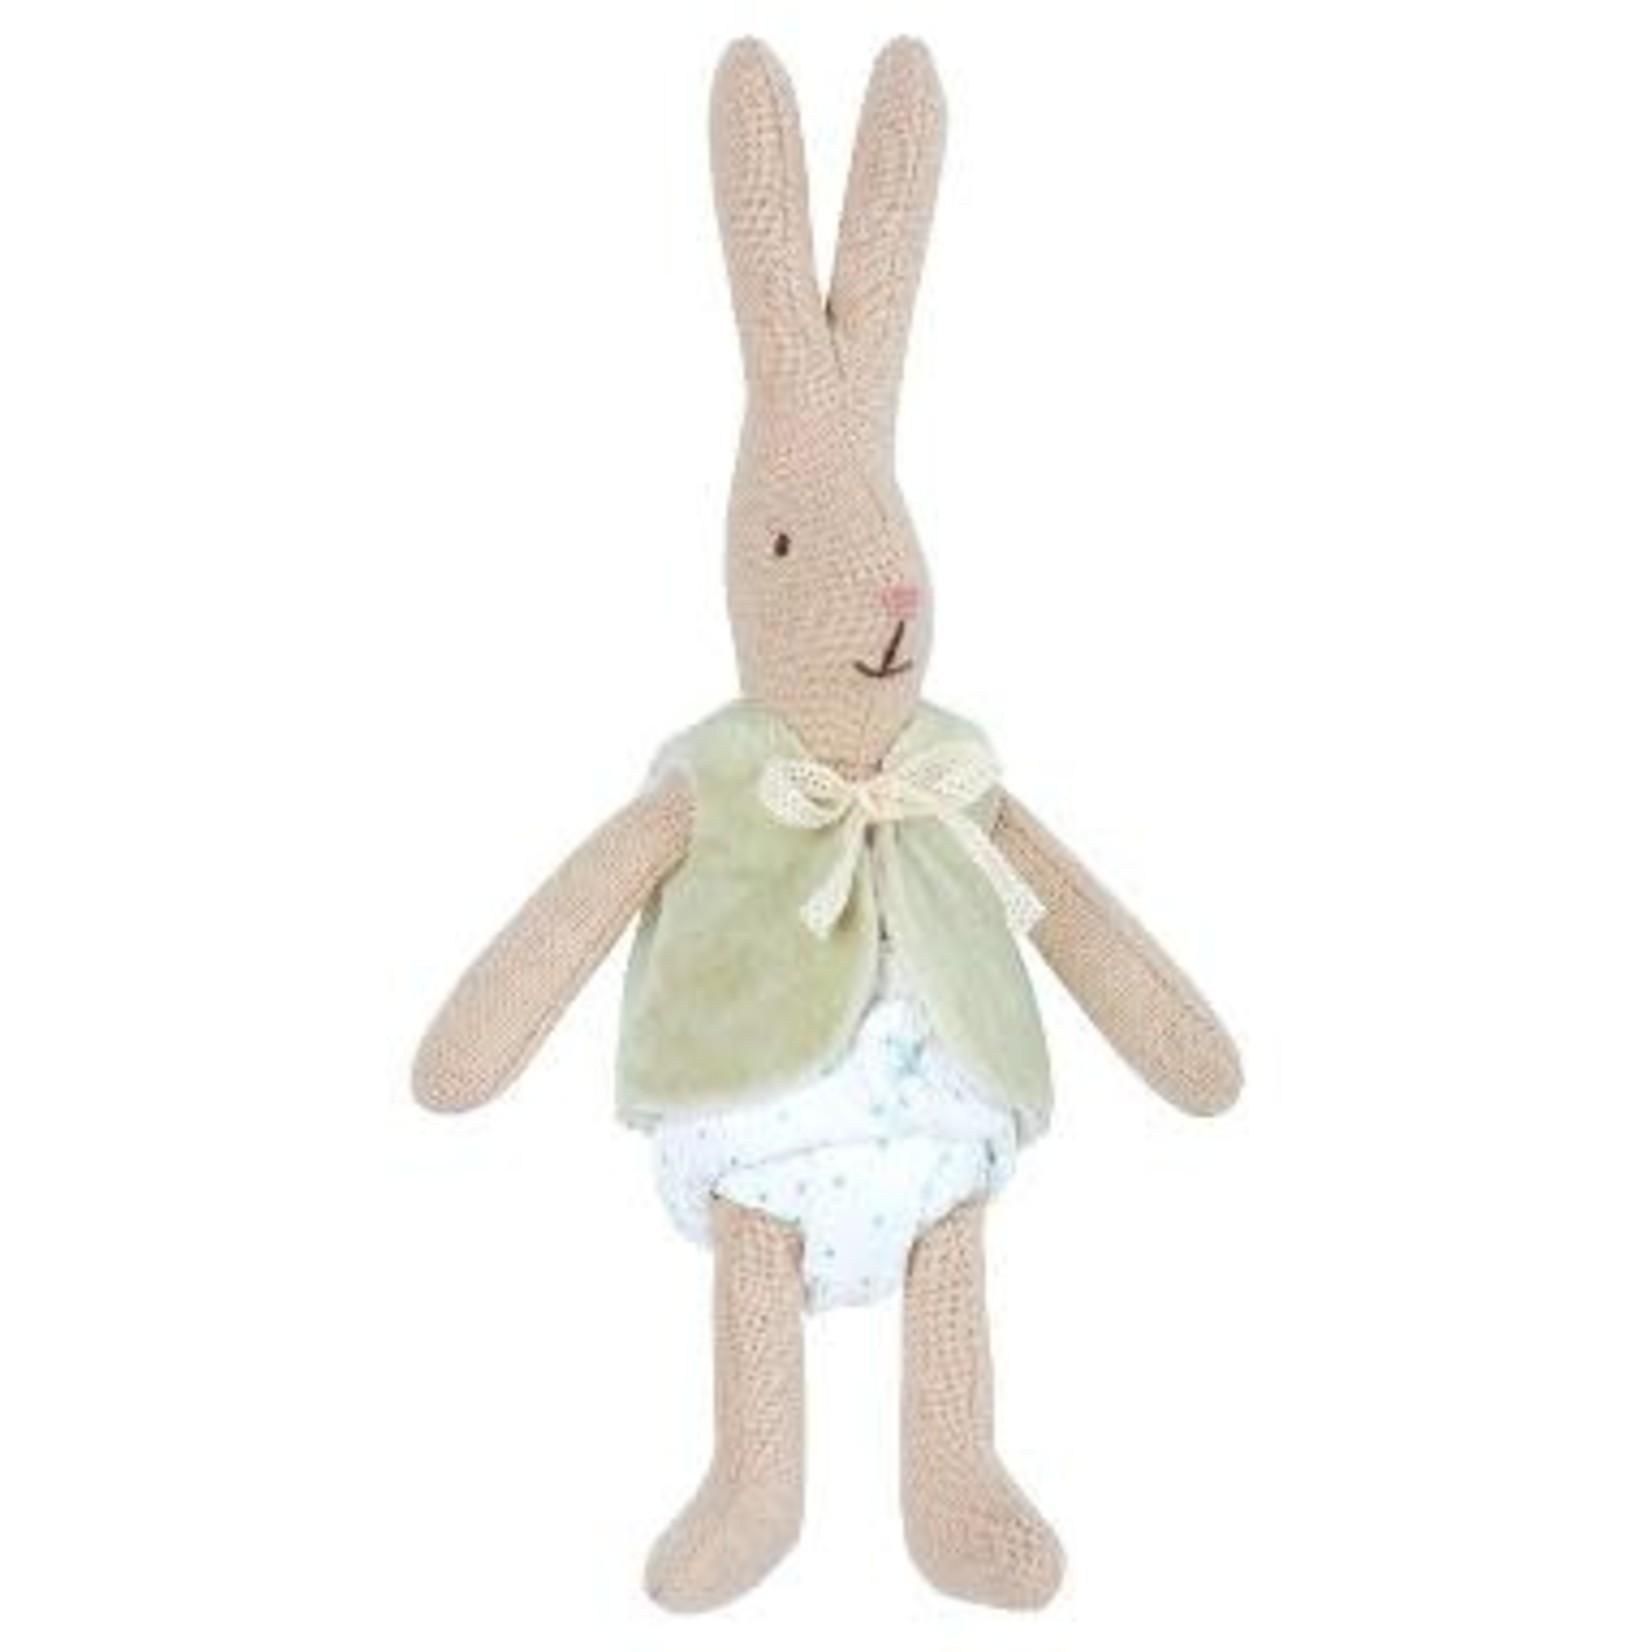 MAILEG Maileg Micro Rabbit with Vest